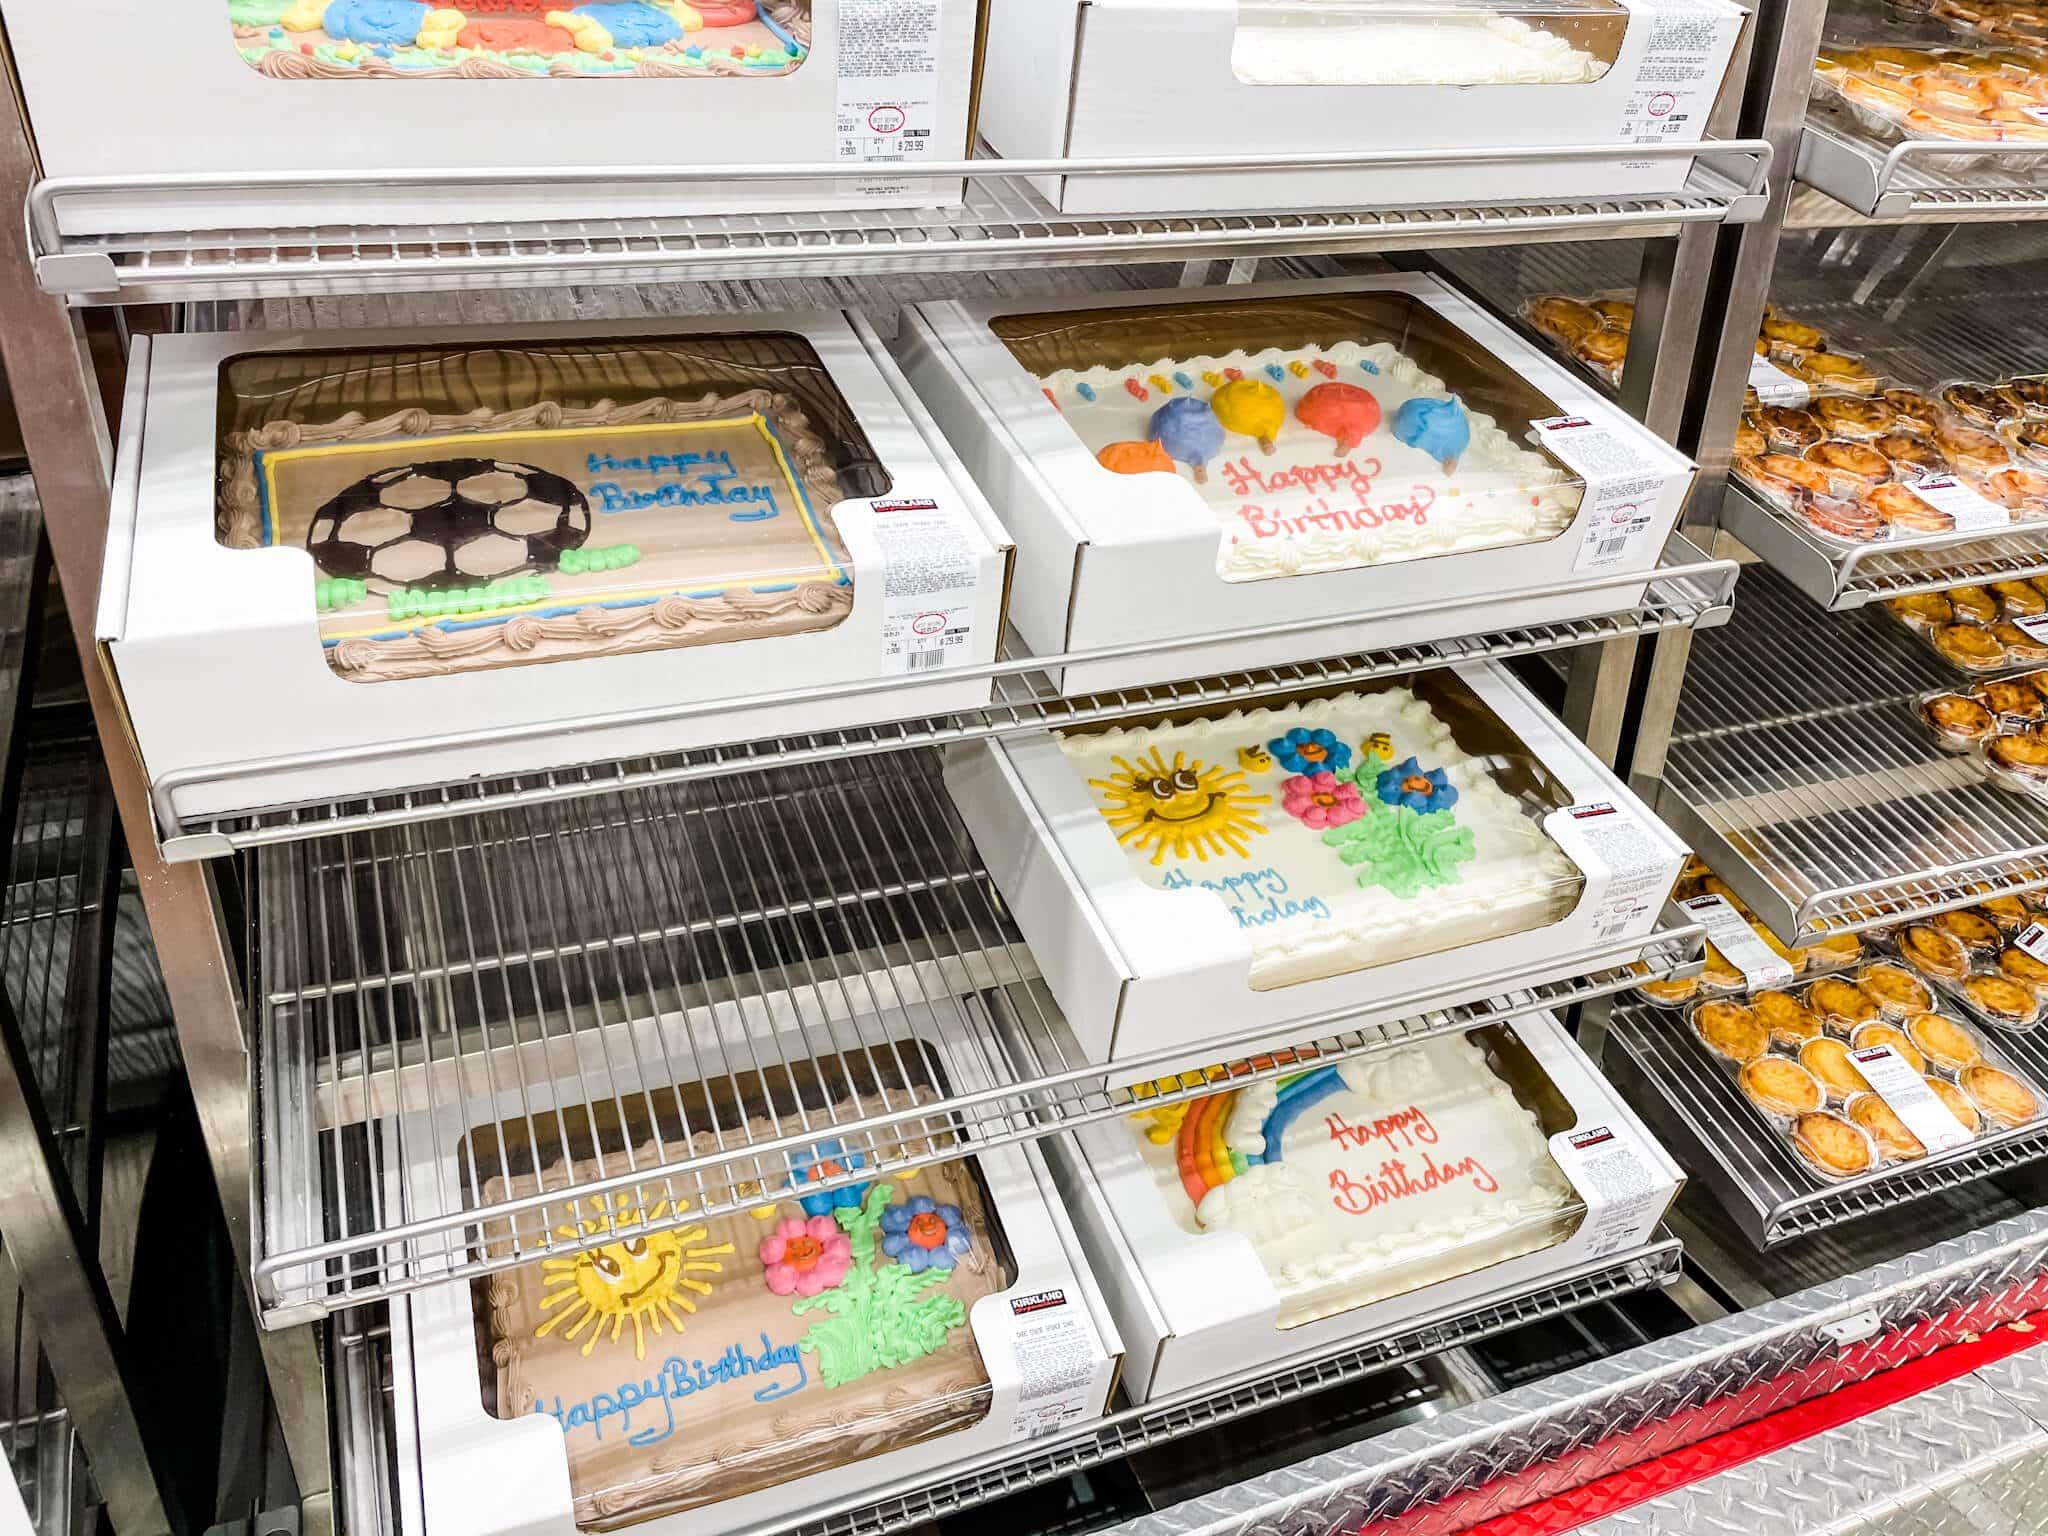 Costco Perth birthday cakes